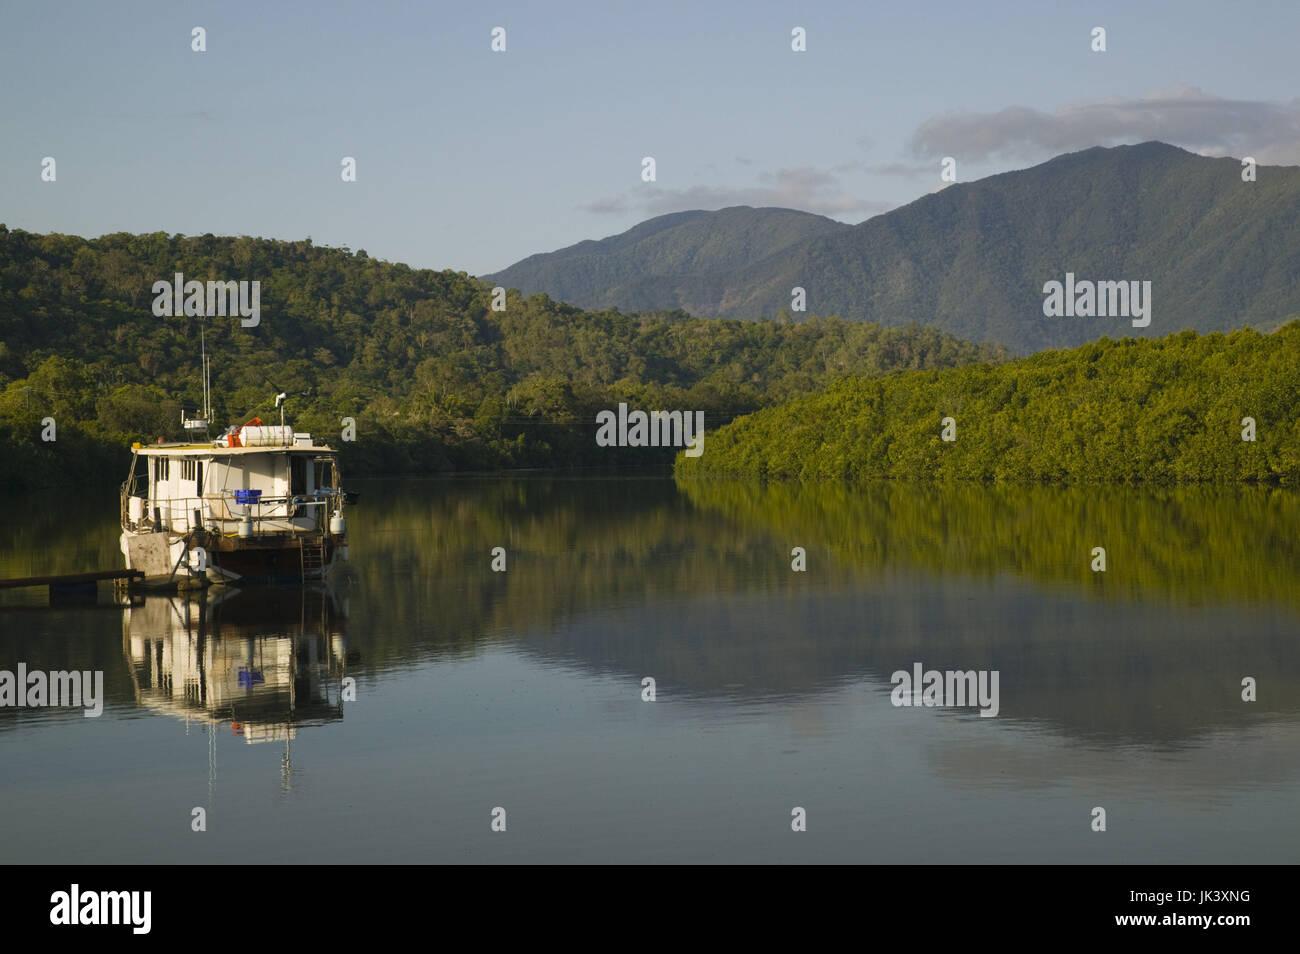 Australia, Queensland, North Coast, Cairns, Boat on the Barron River, Stock Photo